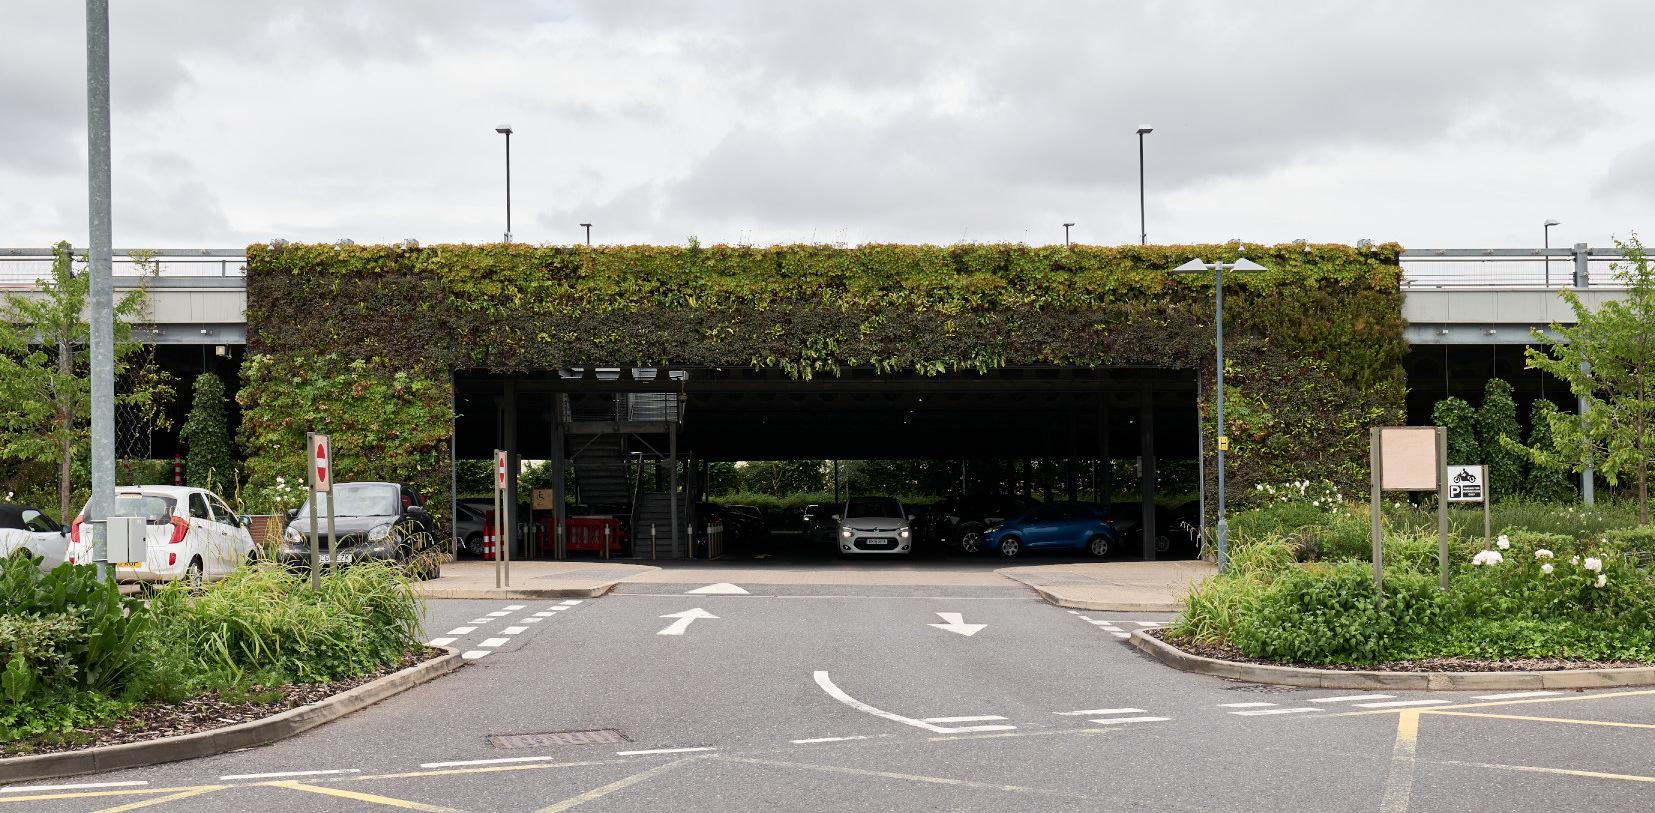 Cheshire Oaks Green Wall Car Park Entrance